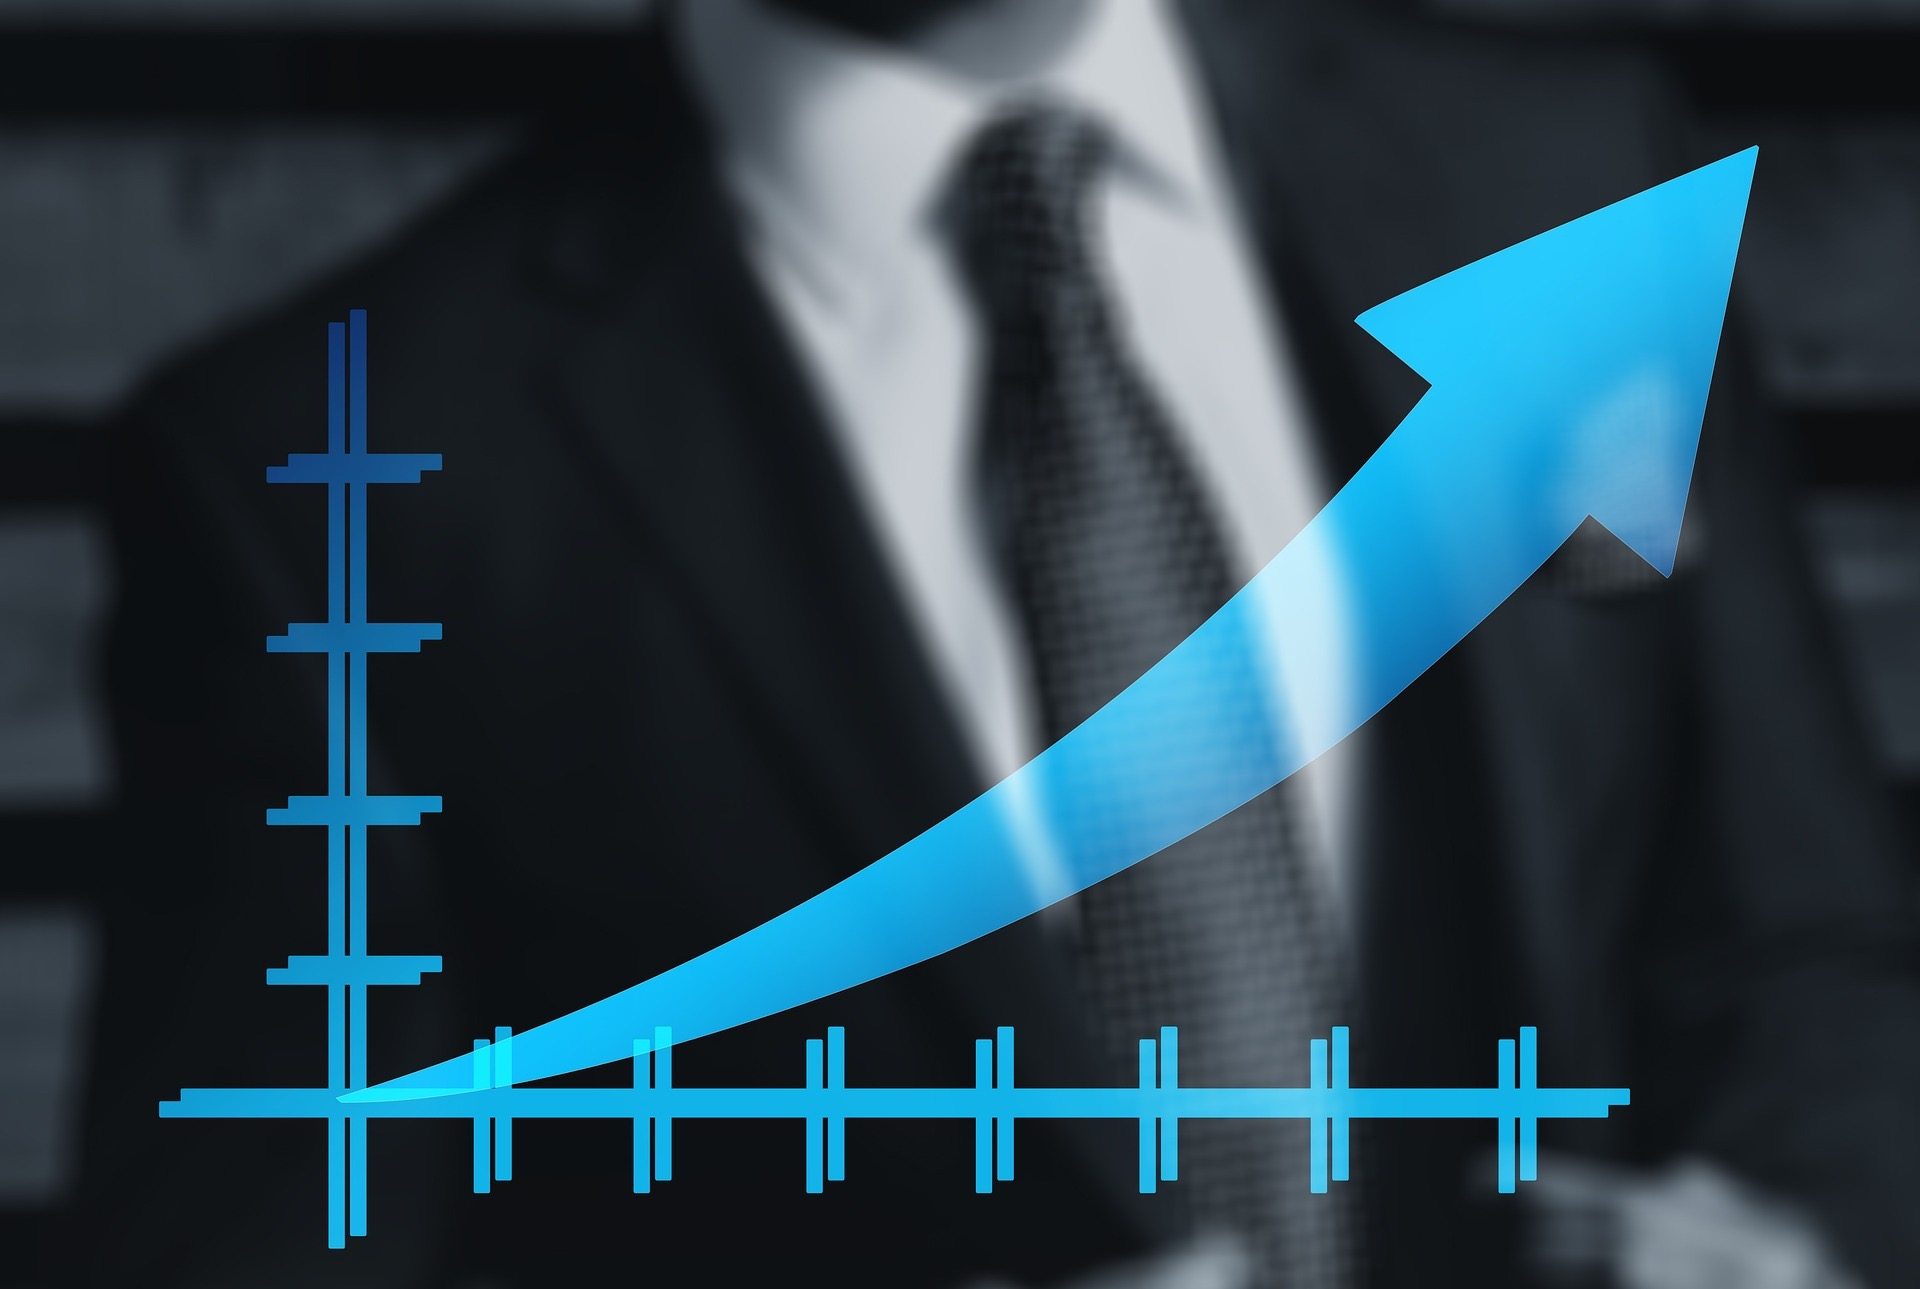 metrics to monitor